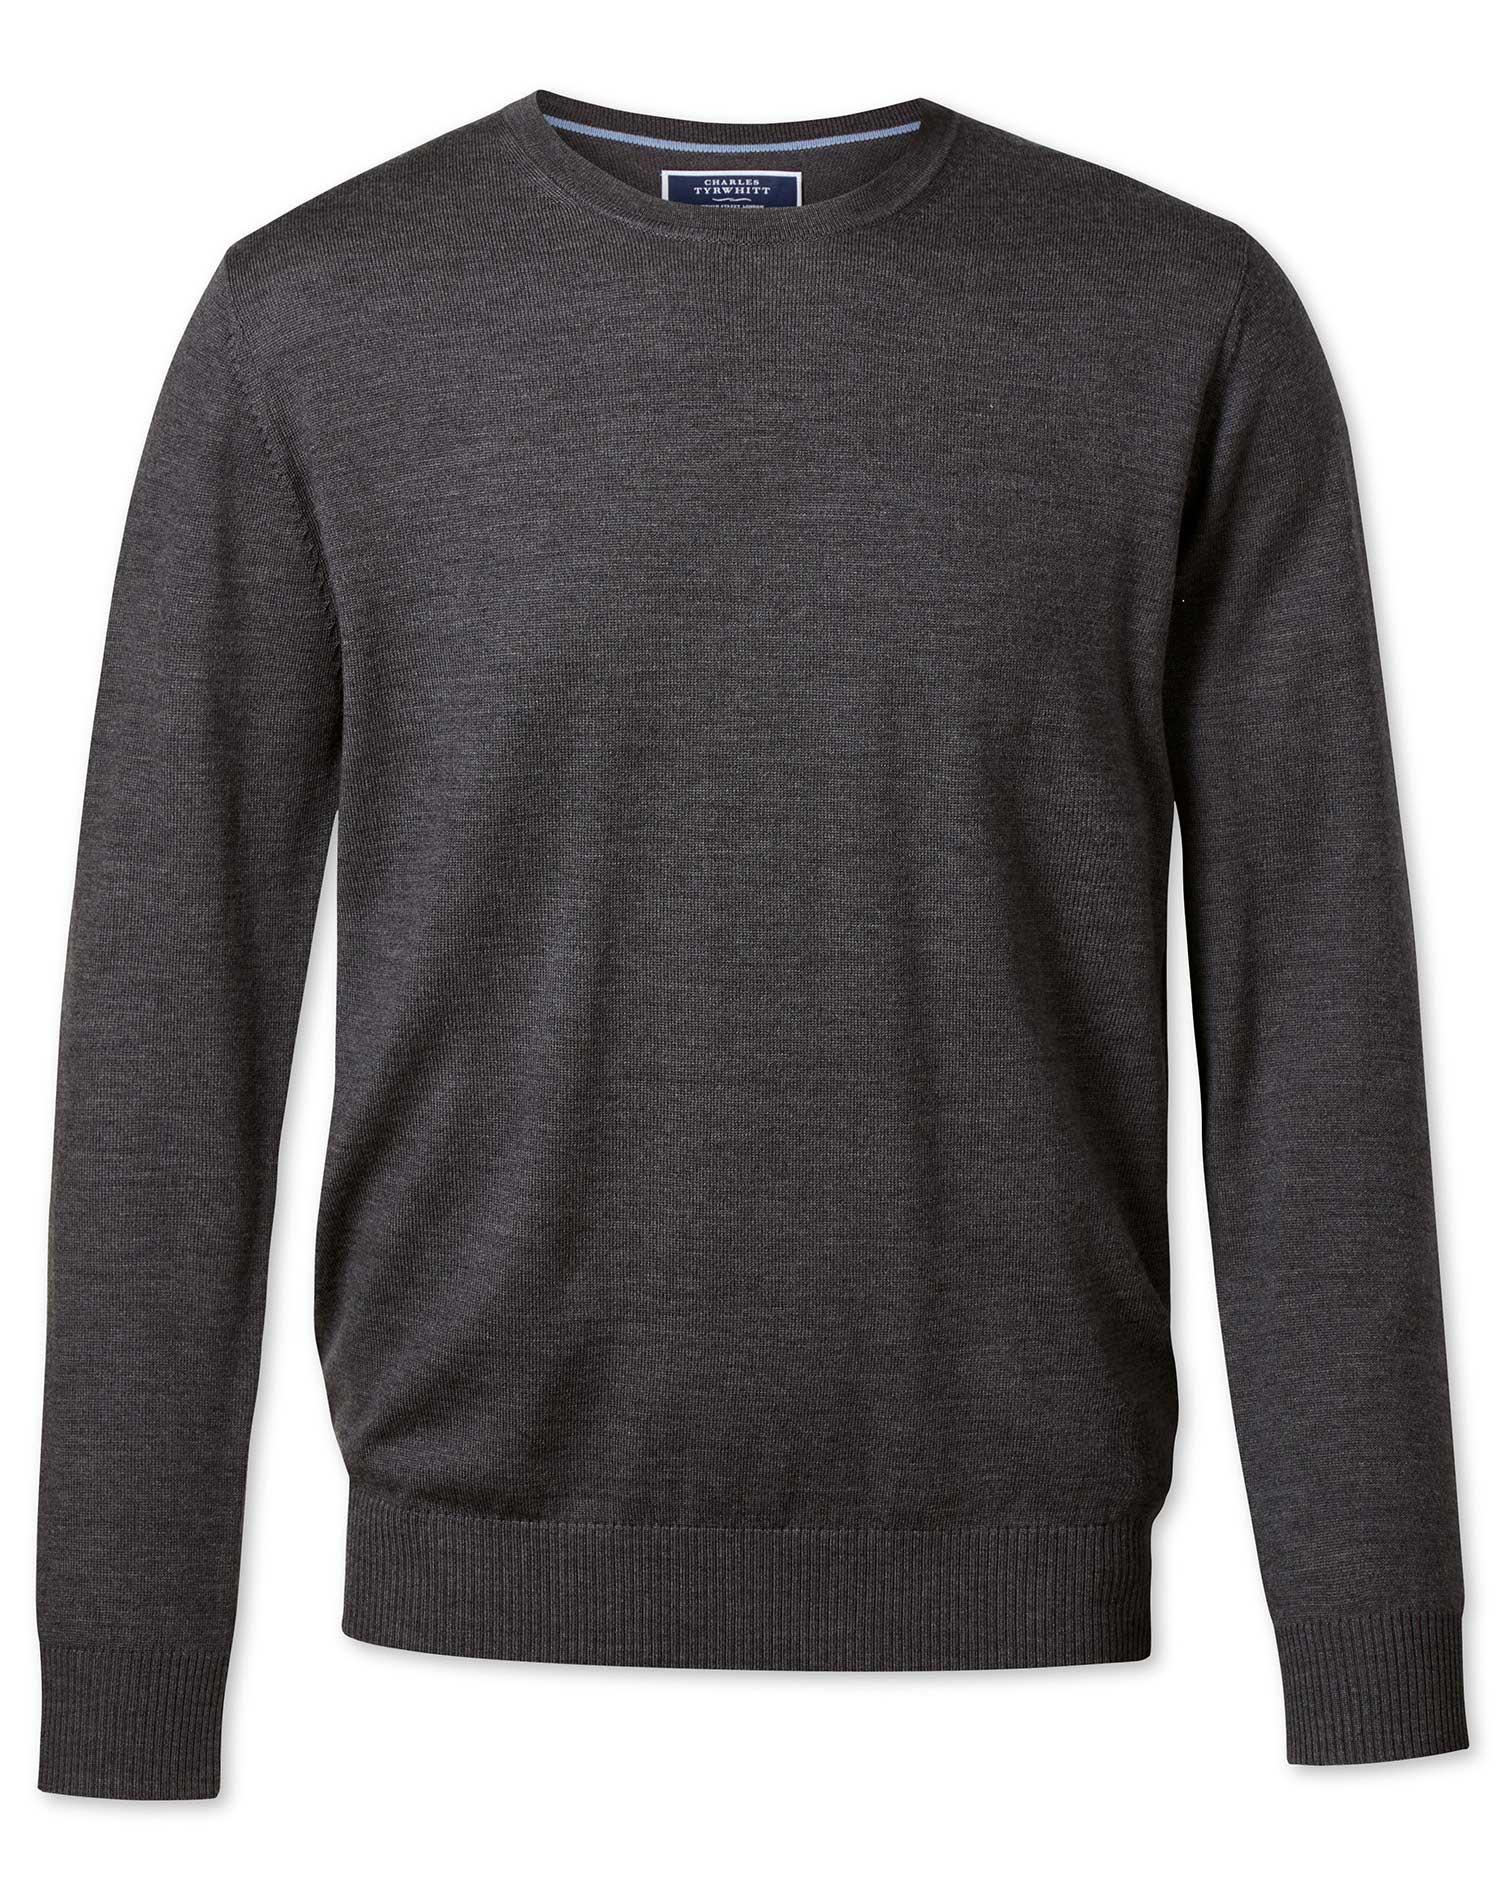 Charcoal Merino Wool Crew Neck Jumper Size XXL by Charles Tyrwhitt